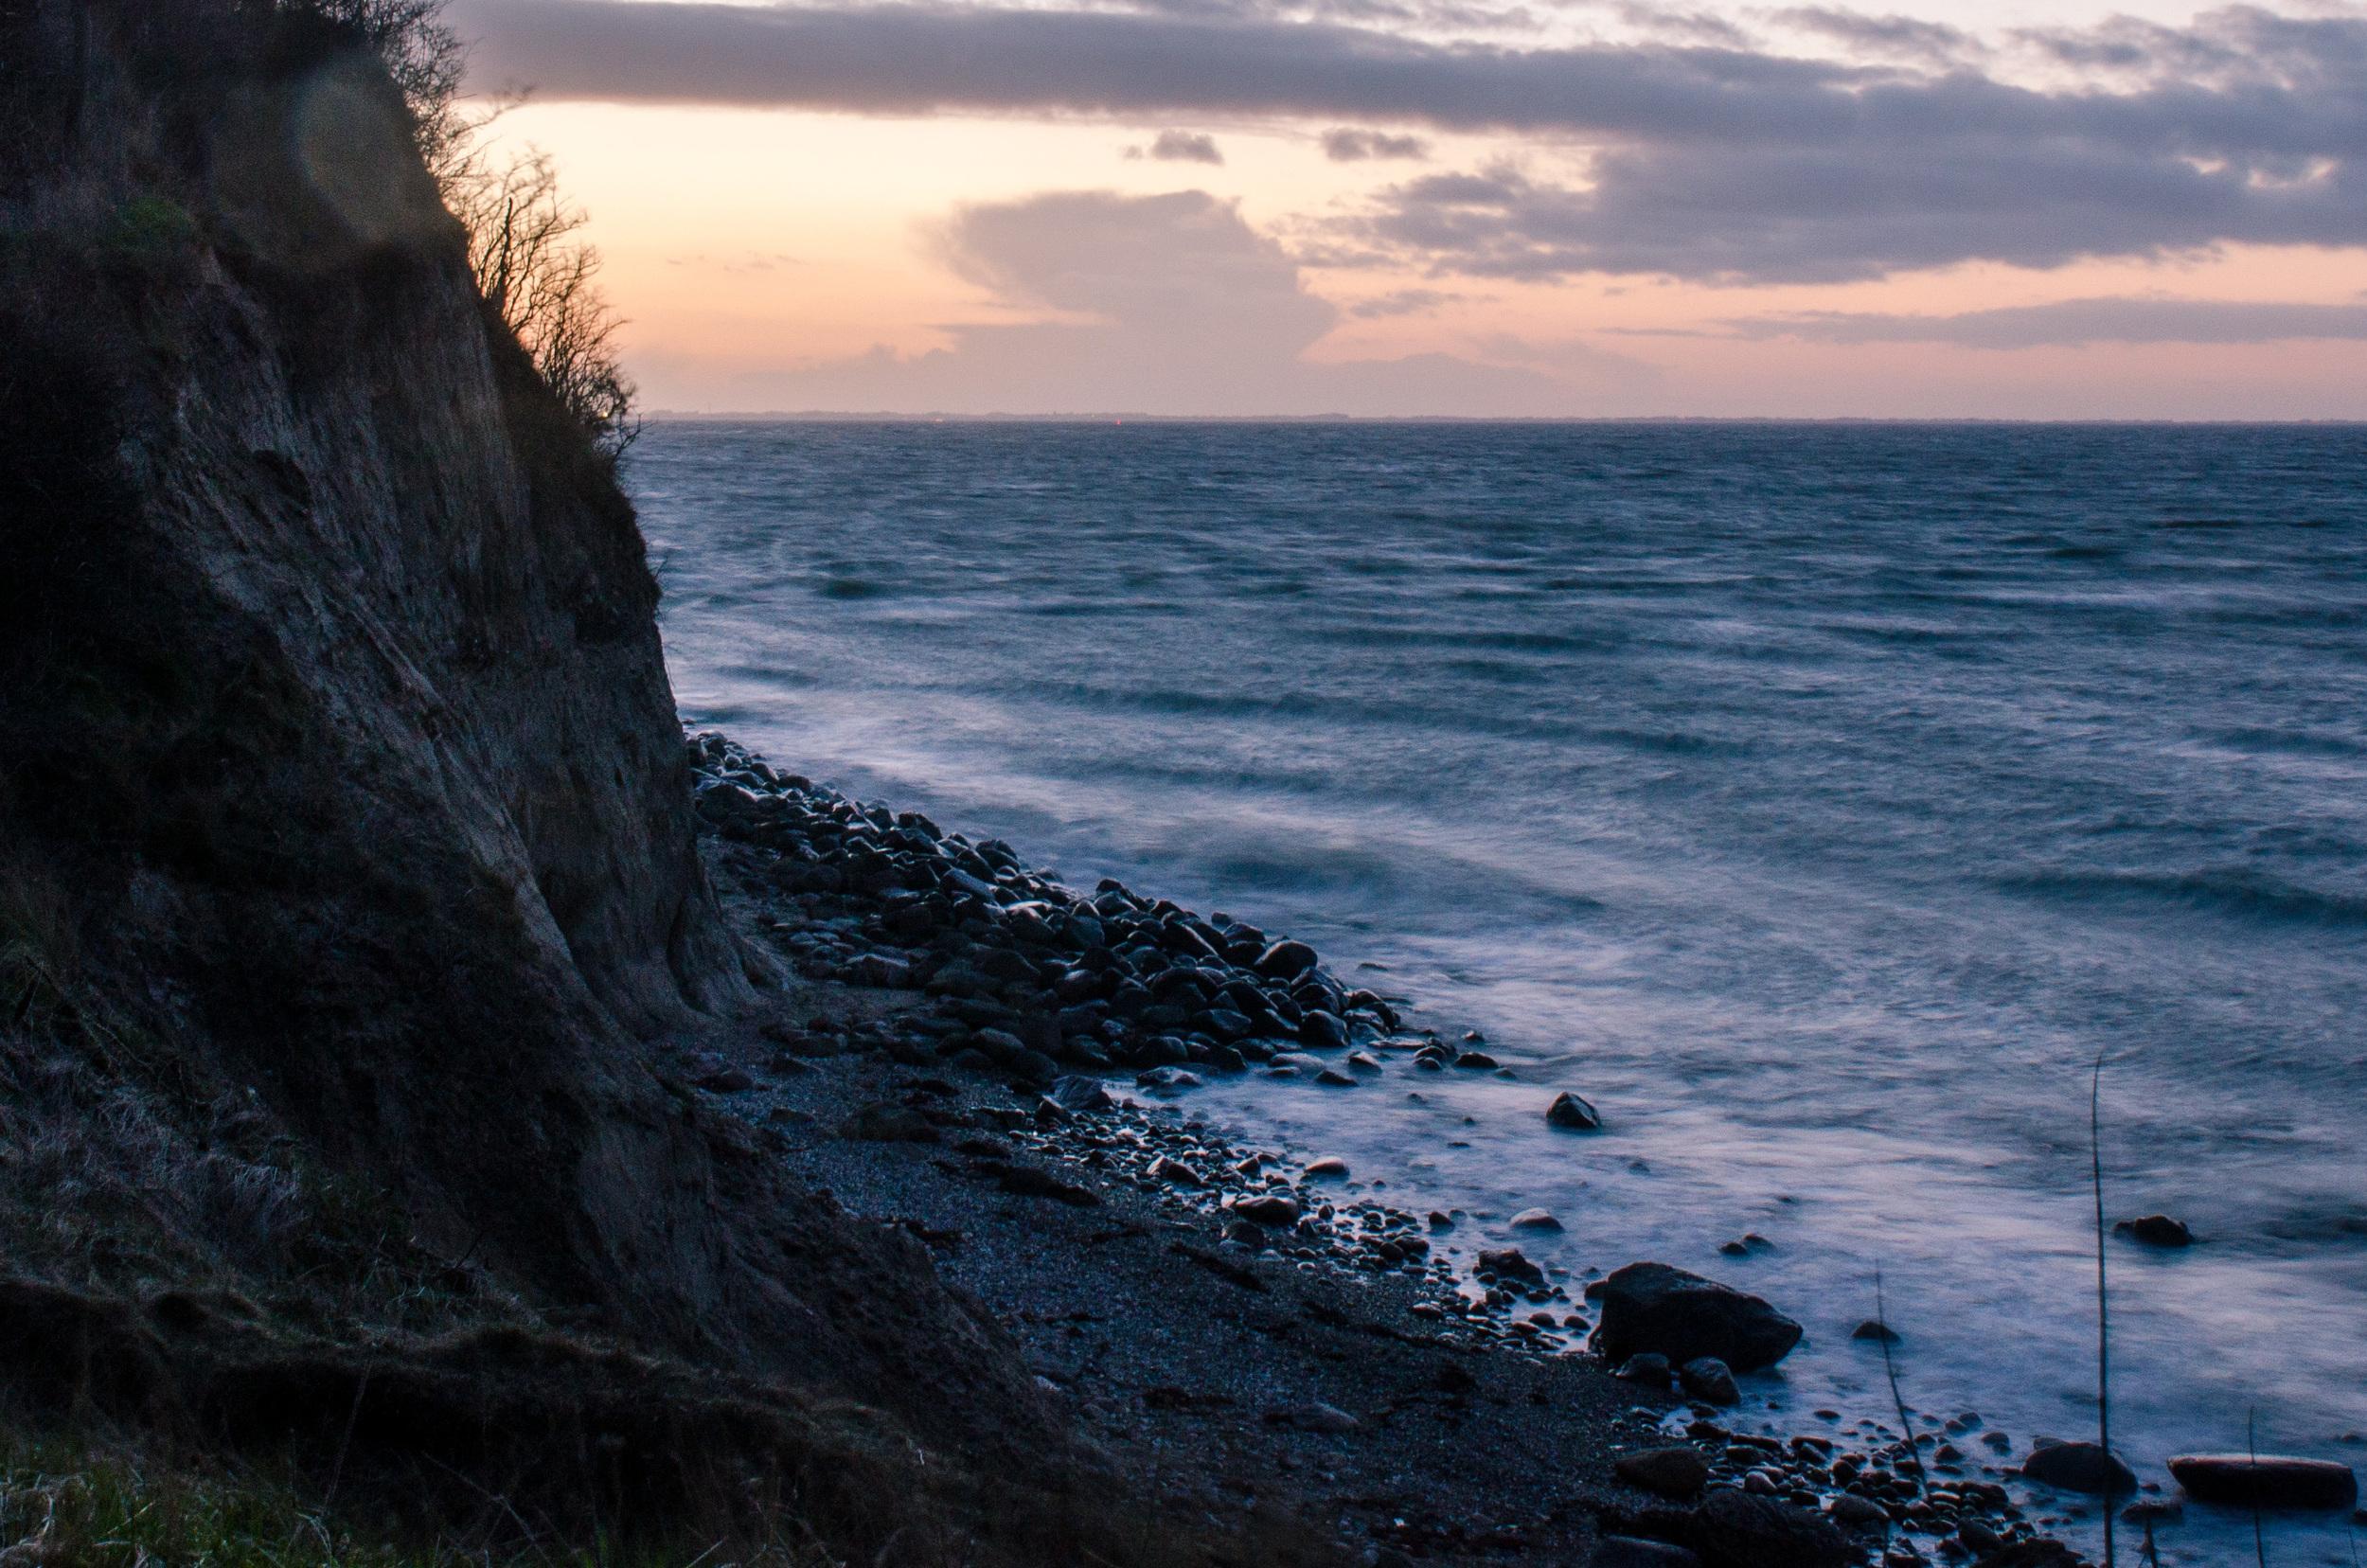 Adventure_photographer_ocean_sea_walk_sunset-7.jpg